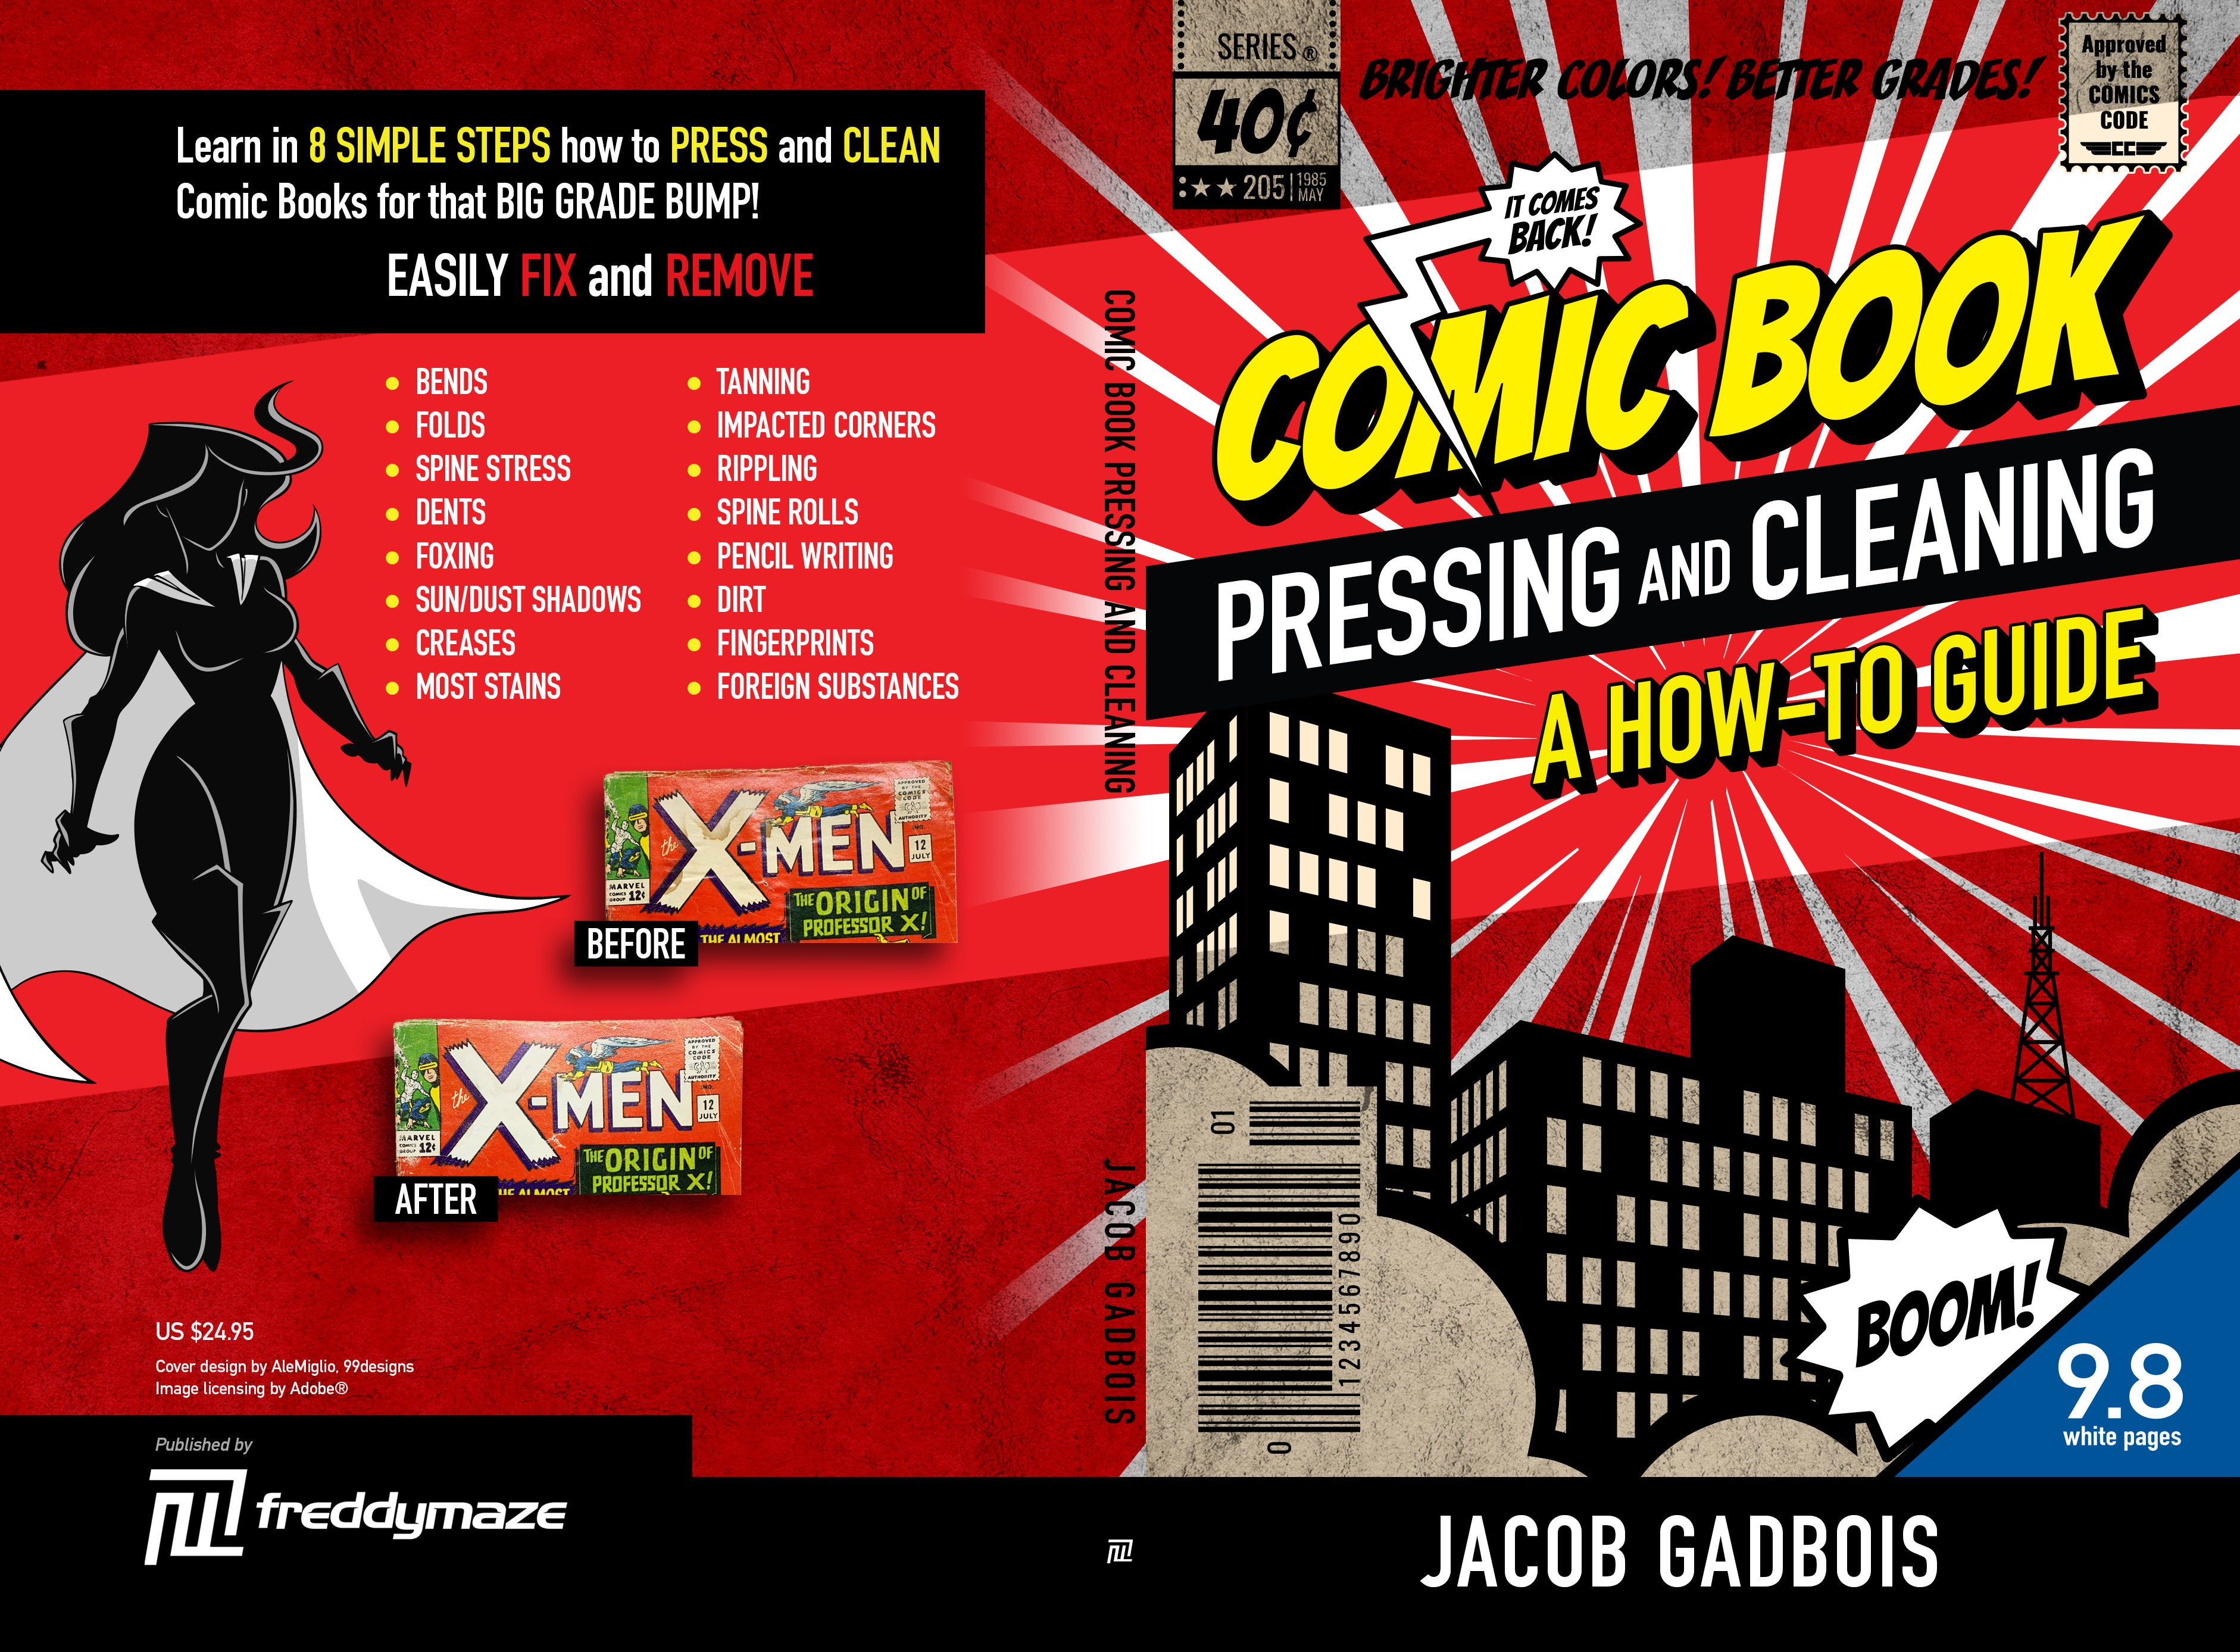 Paperback book cover for comic book restoration techniques!